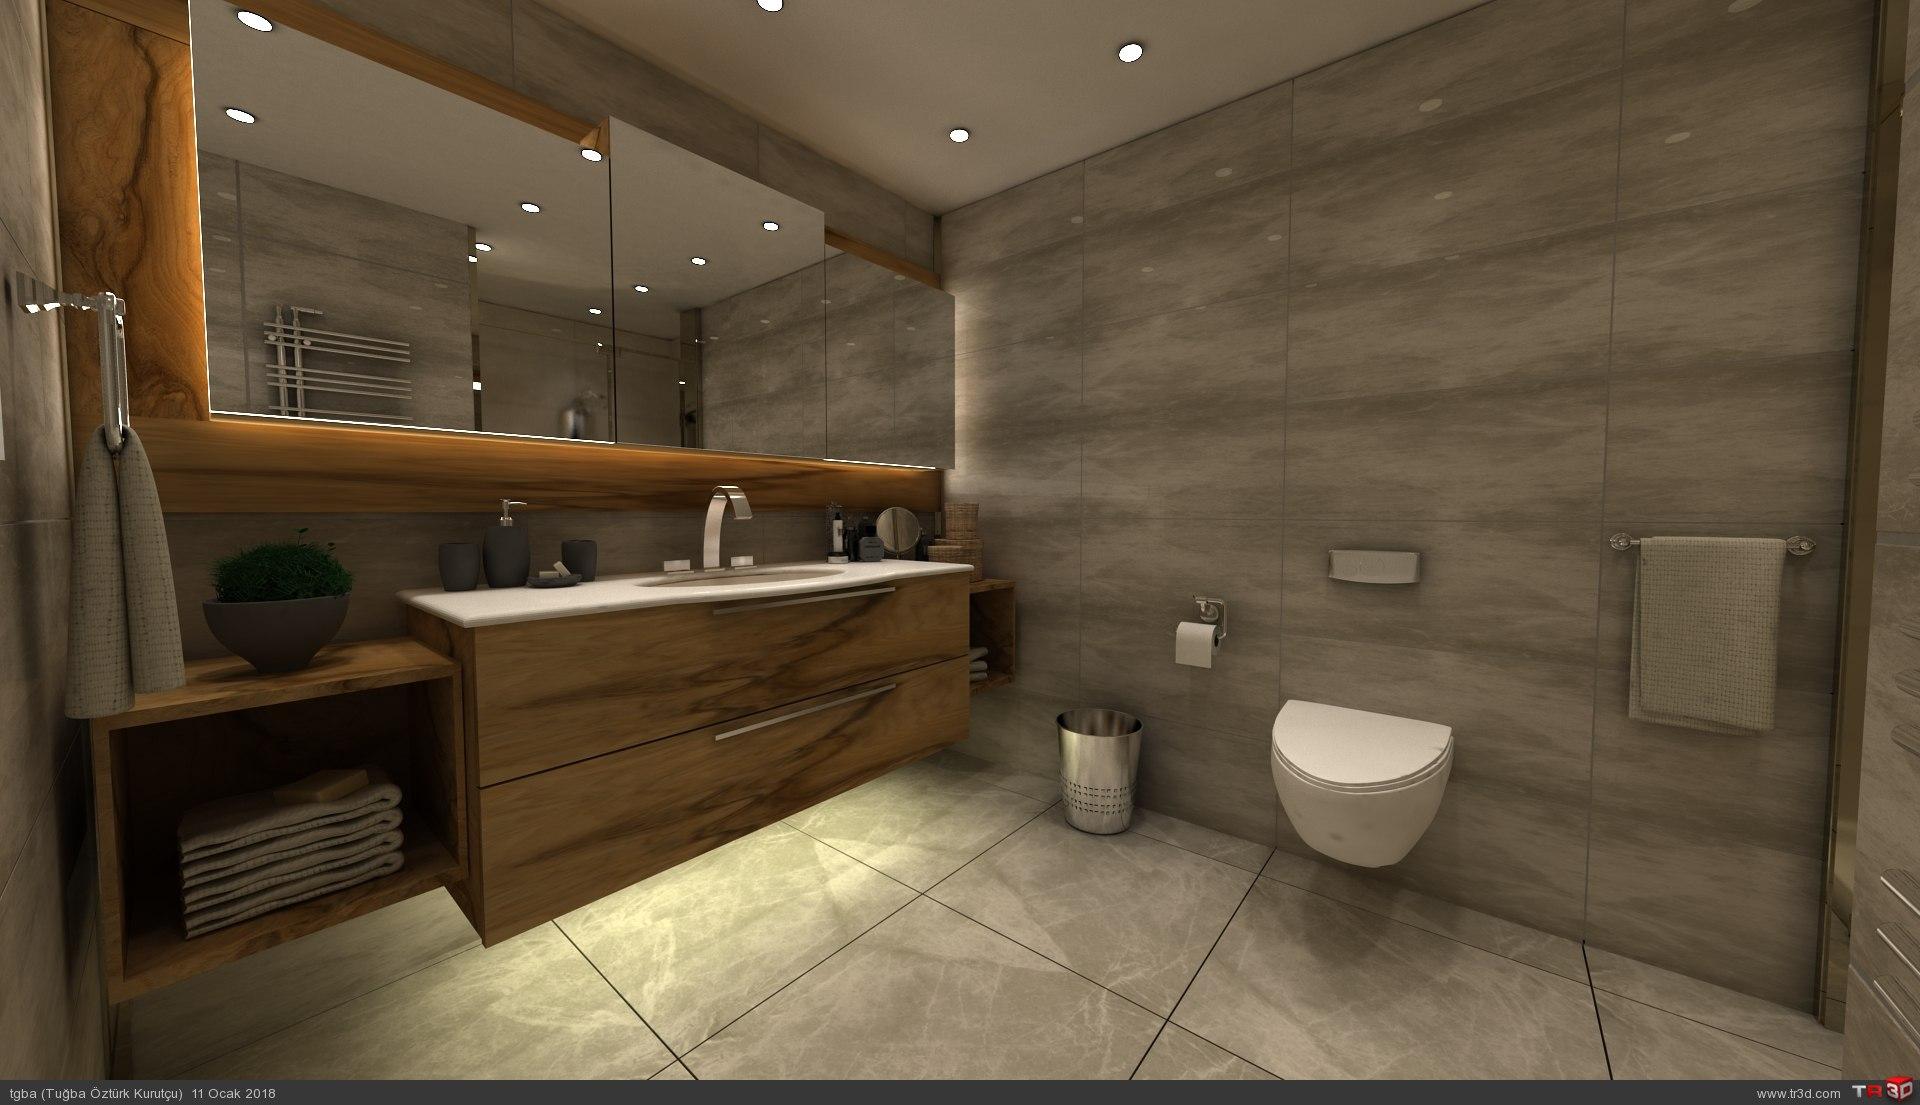 Banyo/bathroom Sade 2